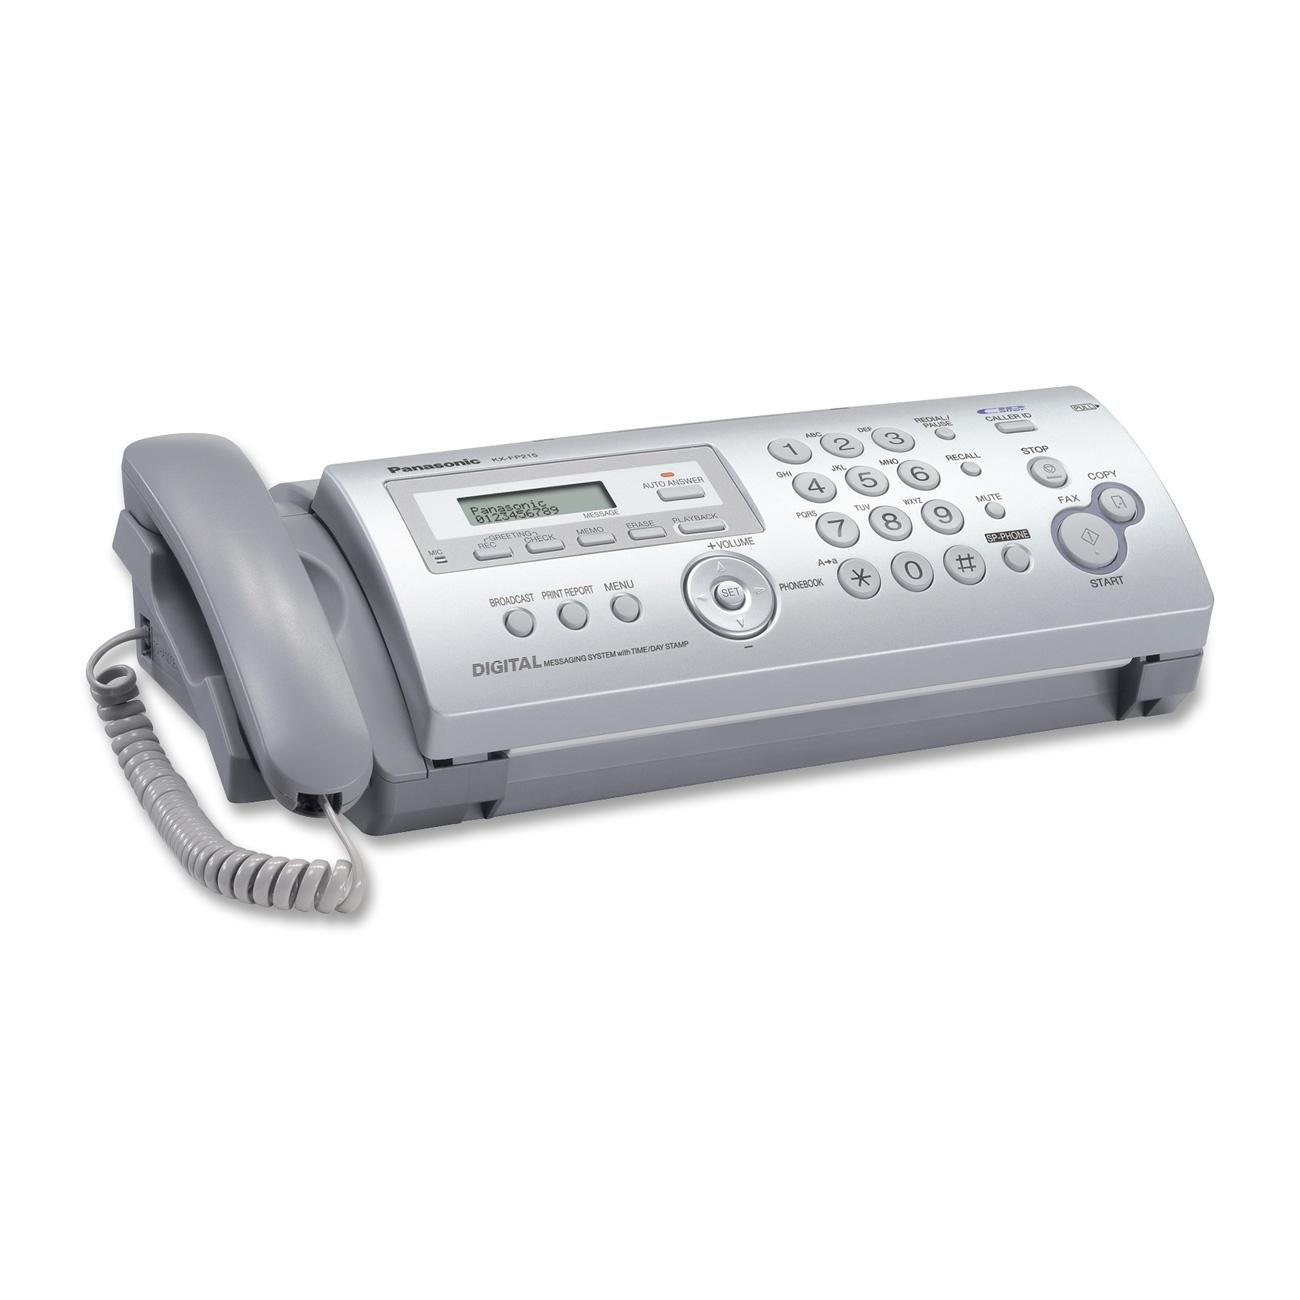 PANKXFP215 - Panasonic Fax Machine KXFP215E 16030017